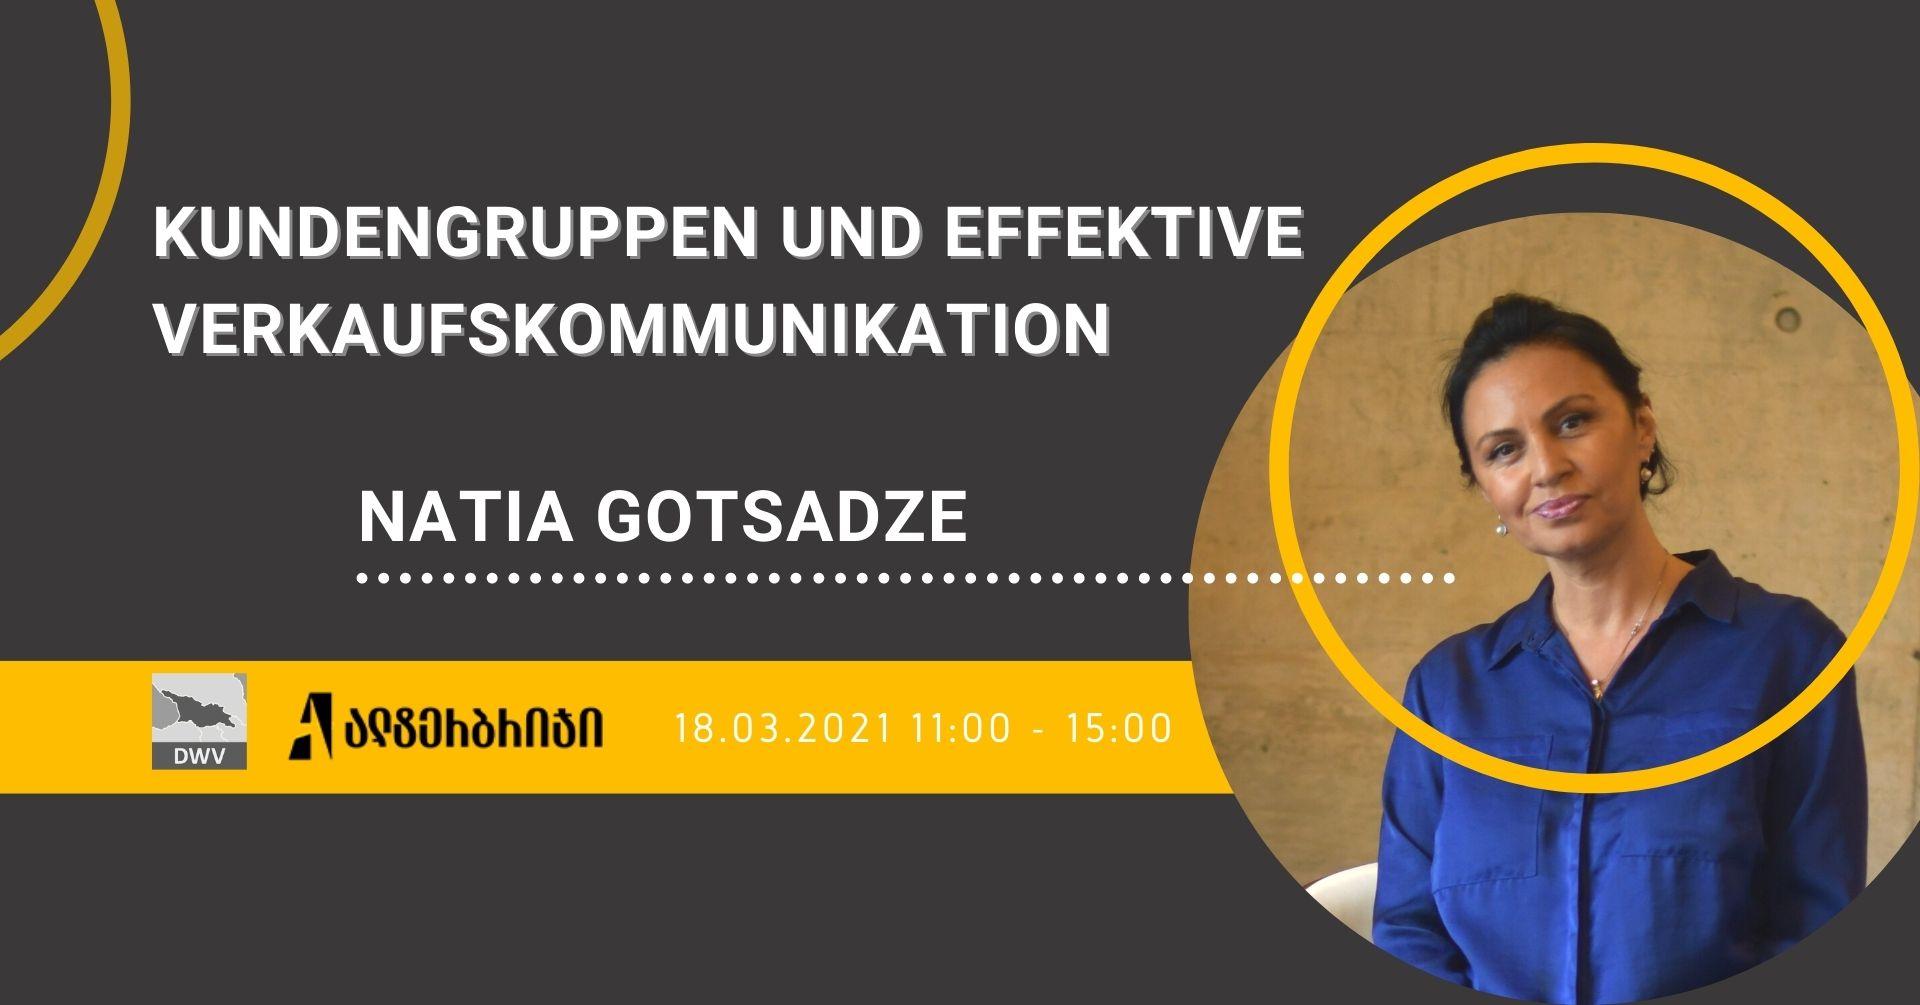 DWV-Training-Alterbridge-Natia-Gotsadze-Kundengruppen-und-Effektive-Verkaufskommunikation